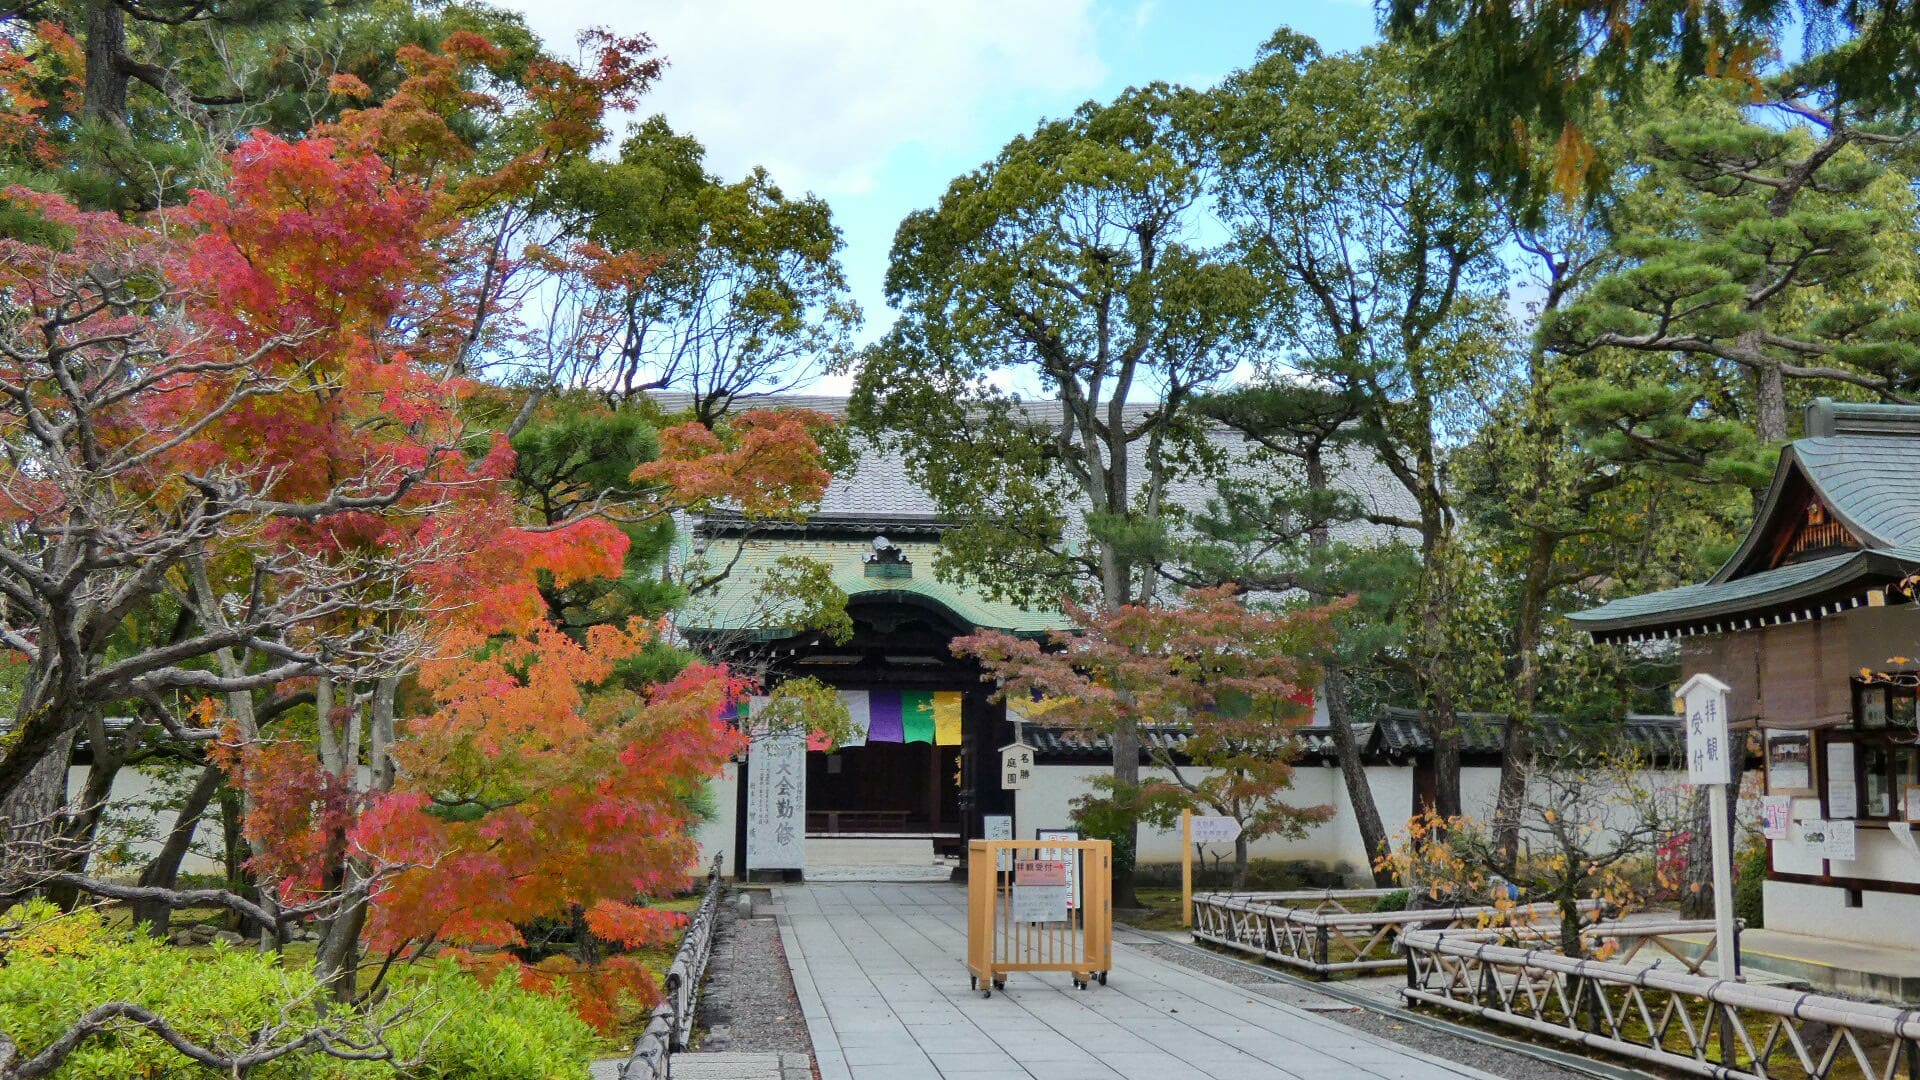 智積院の紅葉 見頃 - 京都で定年後生活